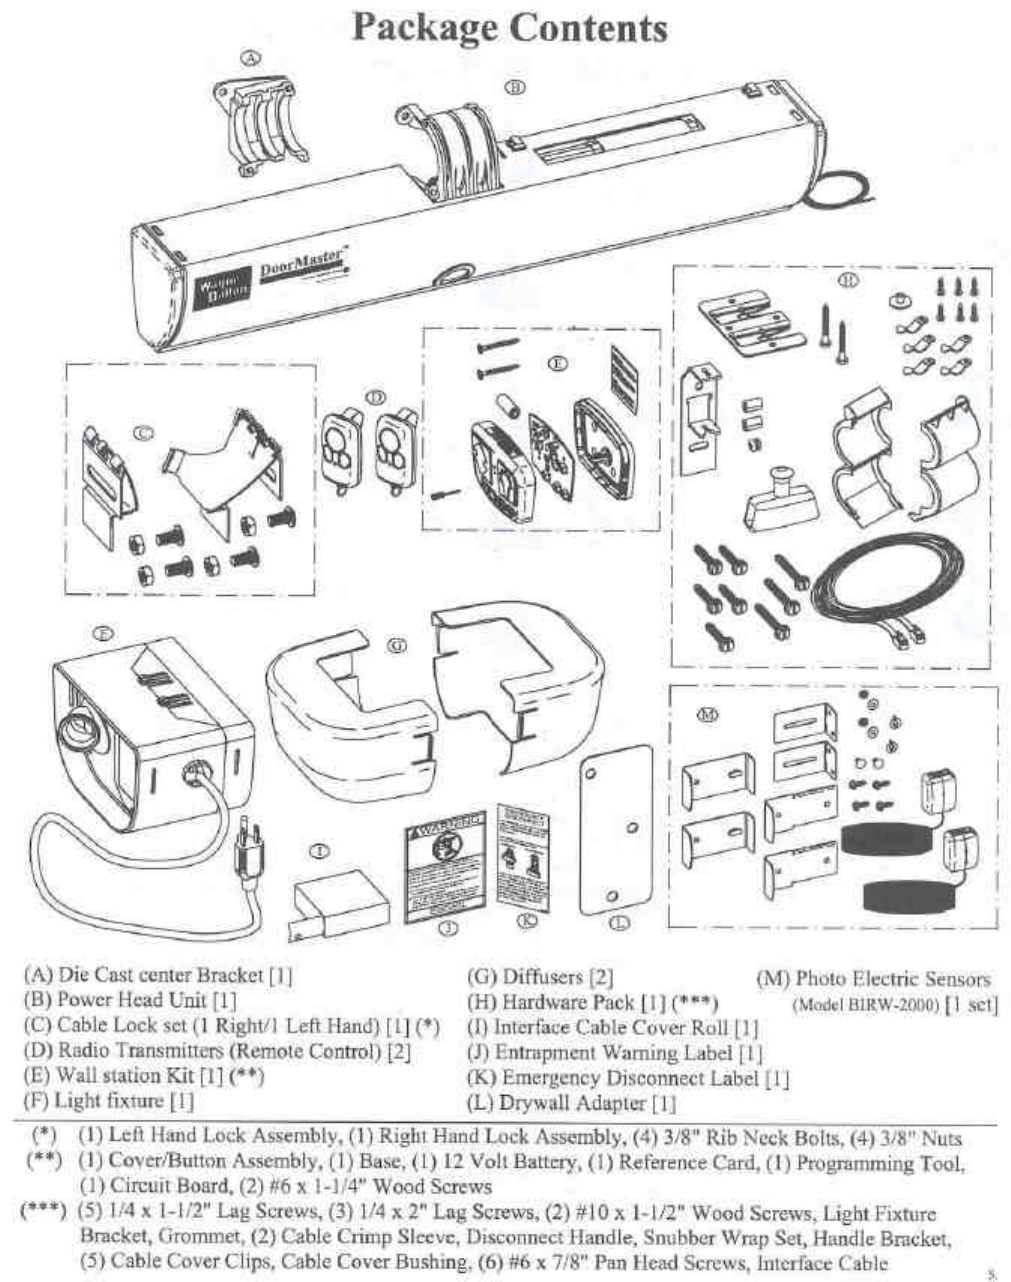 Wayne Dalton Hht 433asw Garage Door Opener User Manual 01 0100 Wiring Diagram Fcc Id Kj8hht